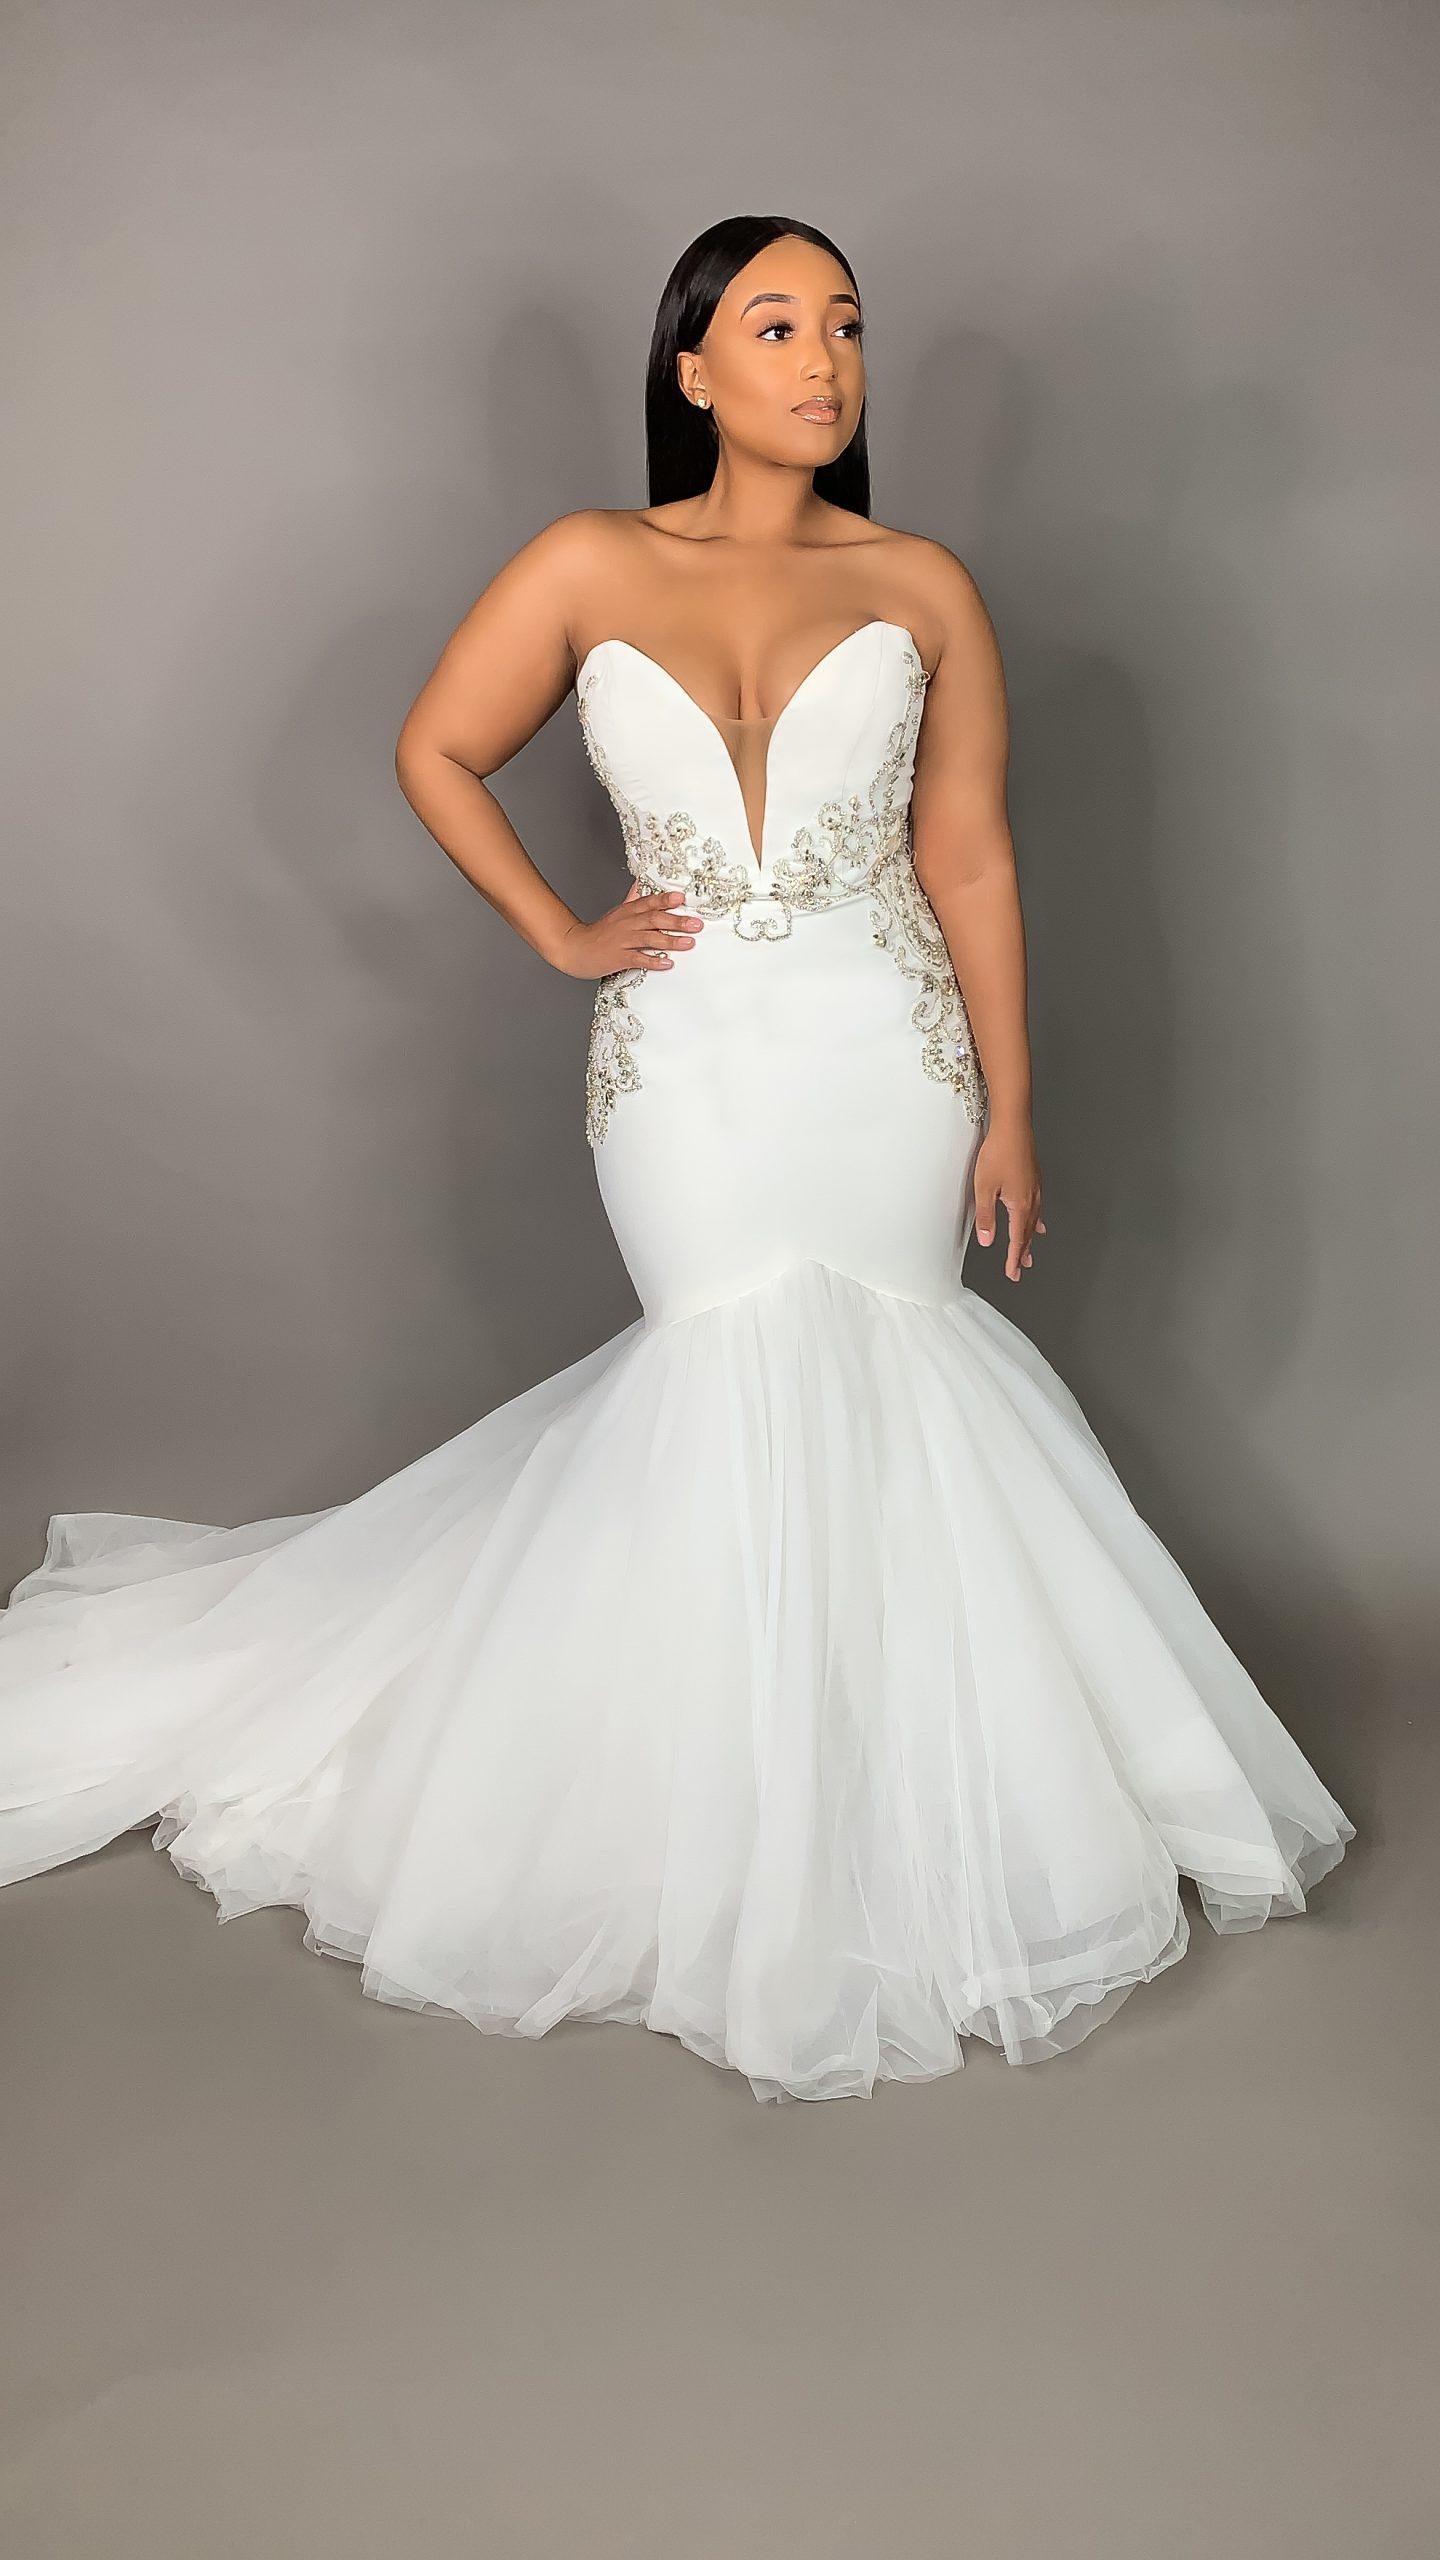 Strapless Plunging Sweetheart Neckline Mermaid Wedding Dress Kleinfeld Bridal